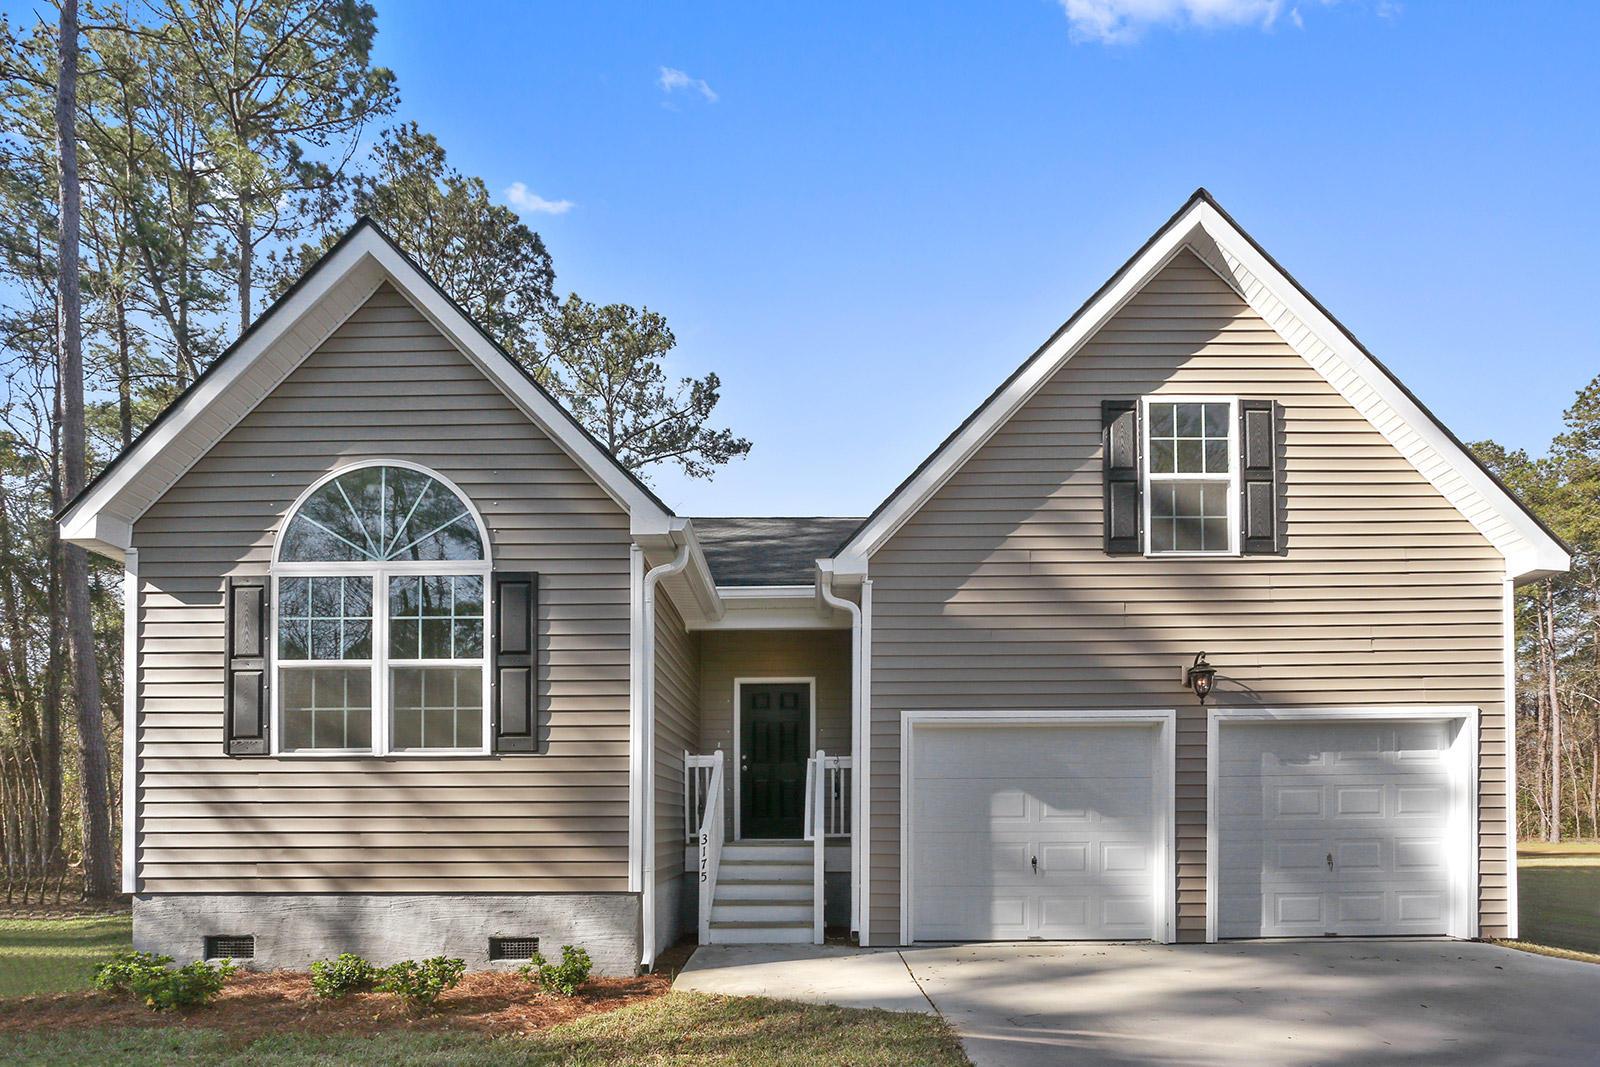 Britton Homes For Sale - 3175 Edenvale, Johns Island, SC - 23